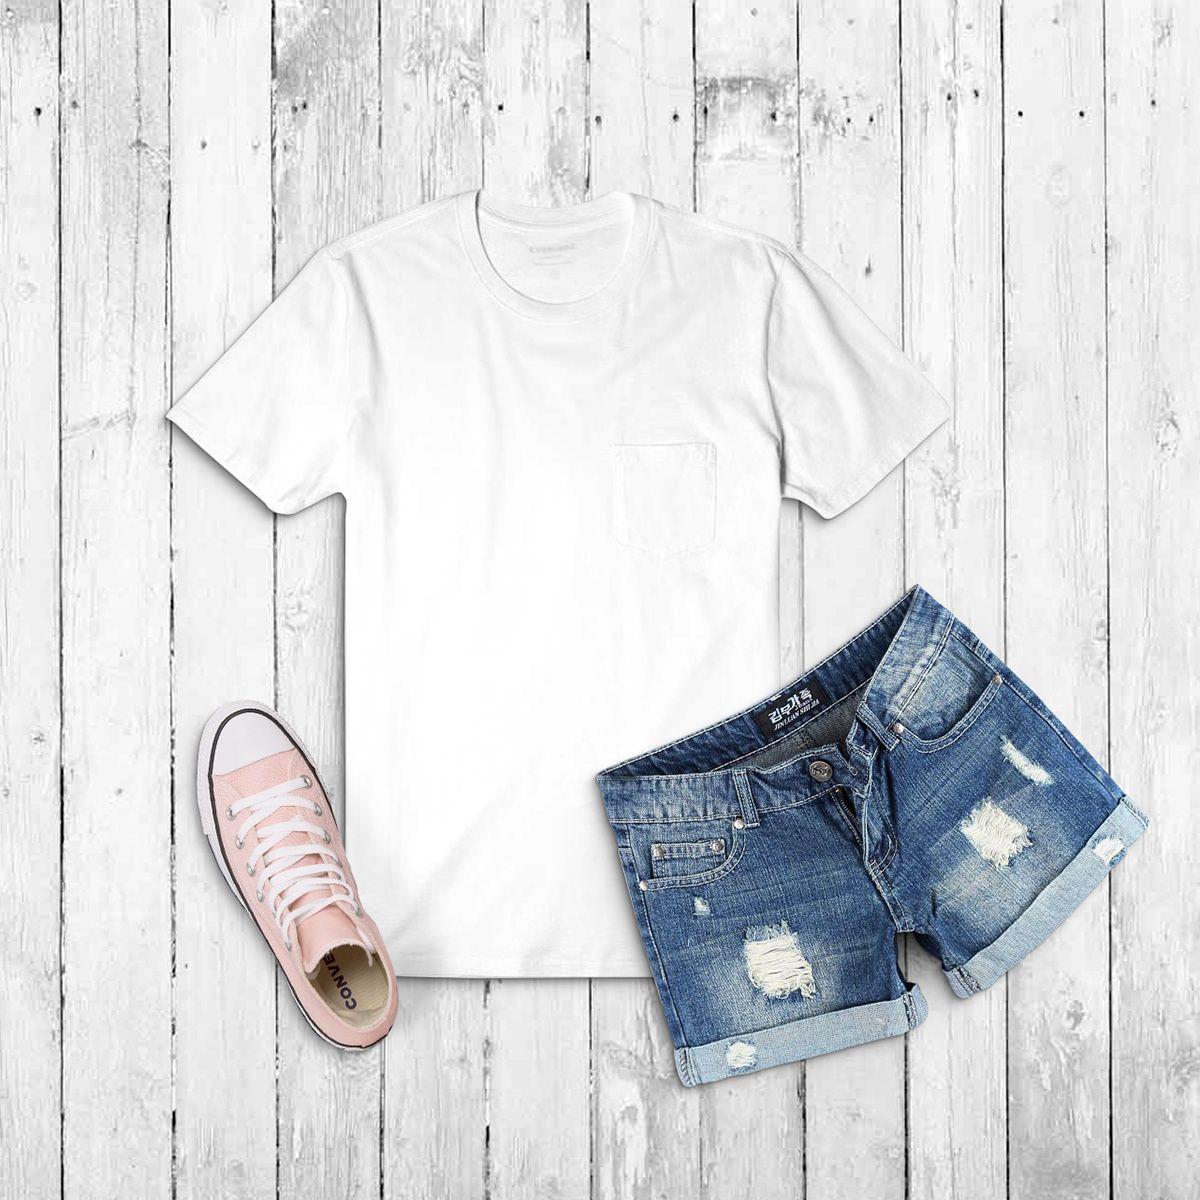 Download Free Shirt Mock Up On Behance Tshirt Mockup Free Clothing Mockup Free Shirts